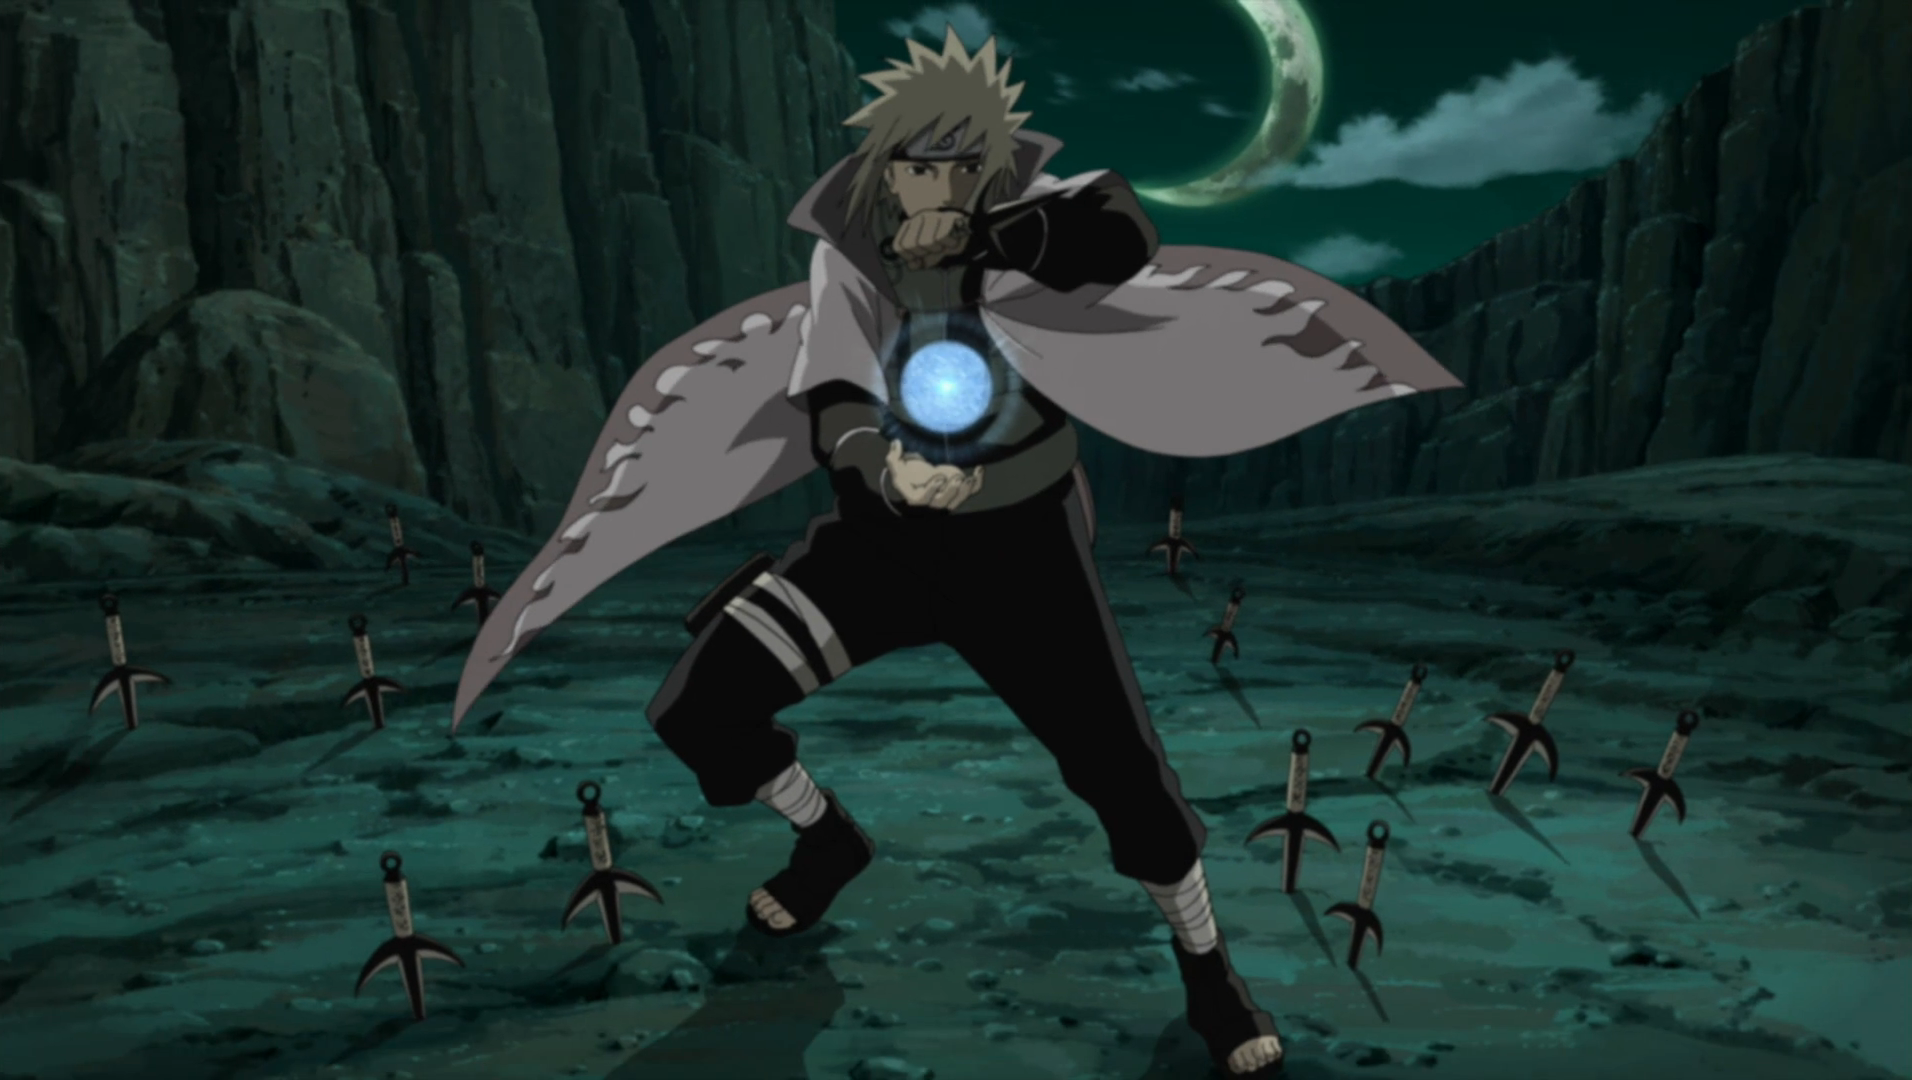 Who is more badass? Naruto or Minato